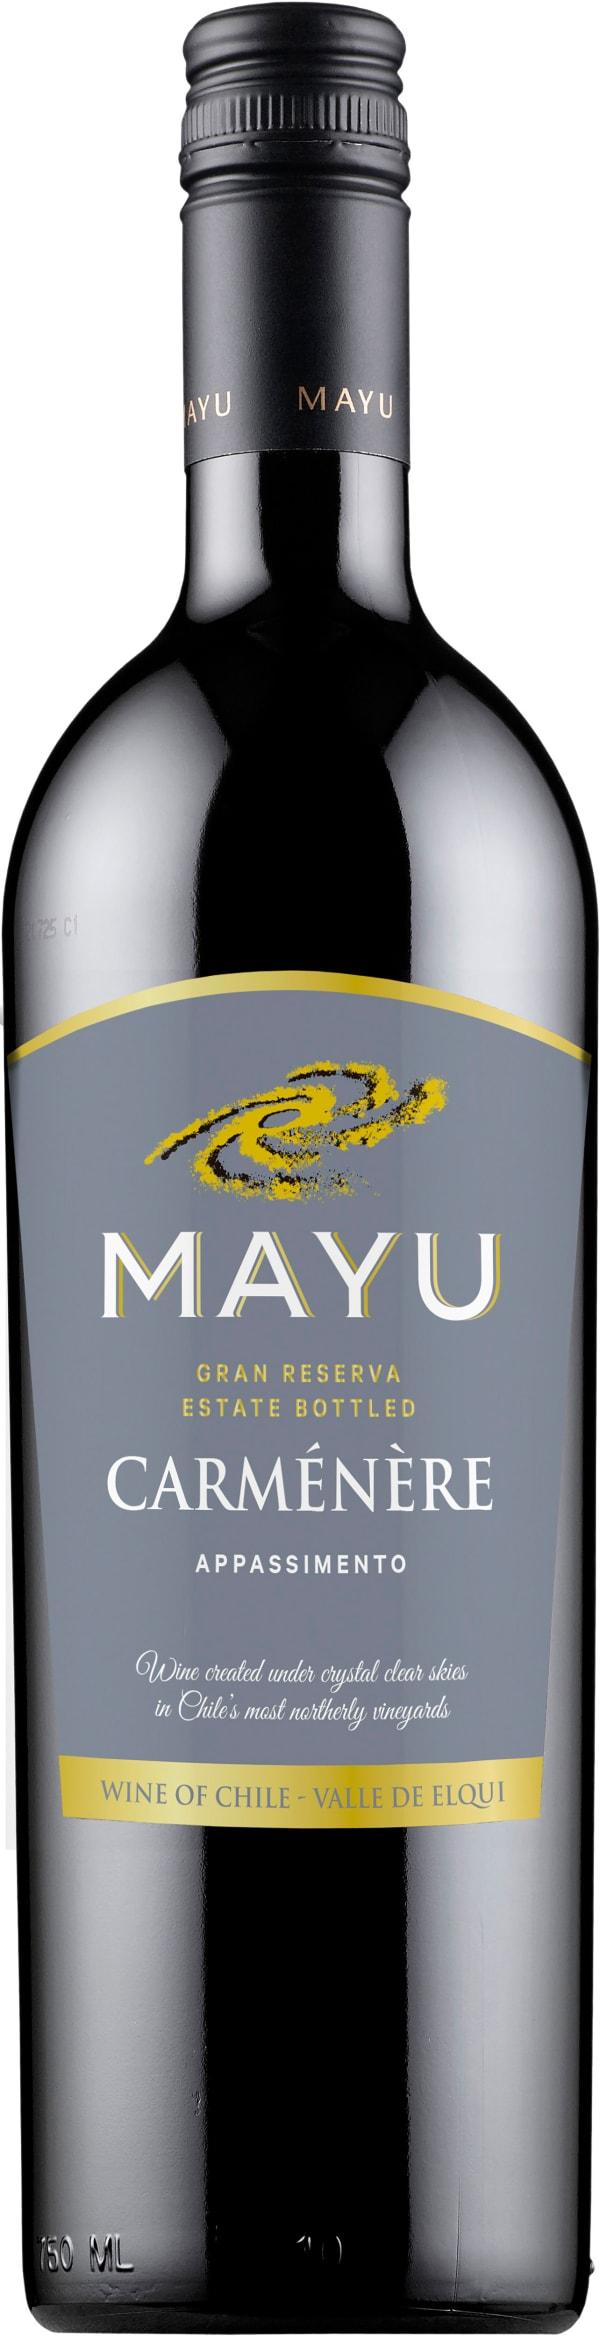 Mayu Gran Reserva Carmenere 2016